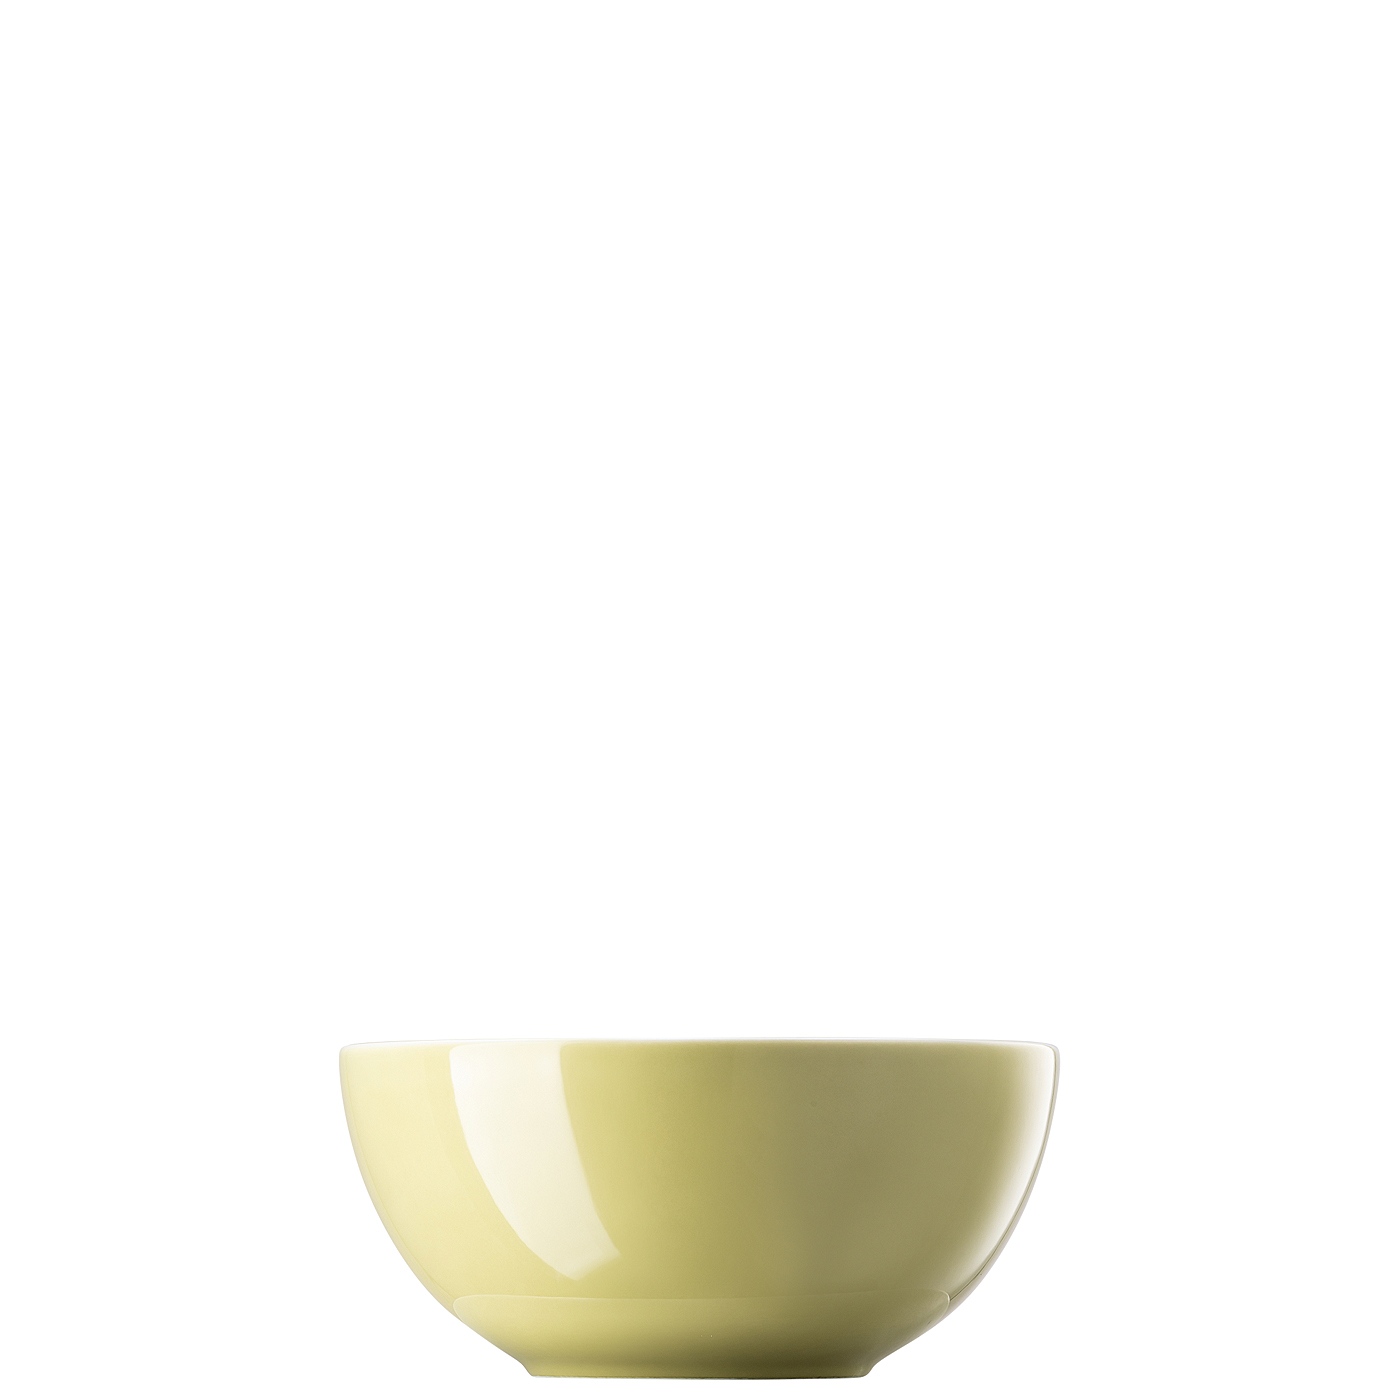 Schüssel 18 cm Sunny Day Avocado Green Thomas Porzellan